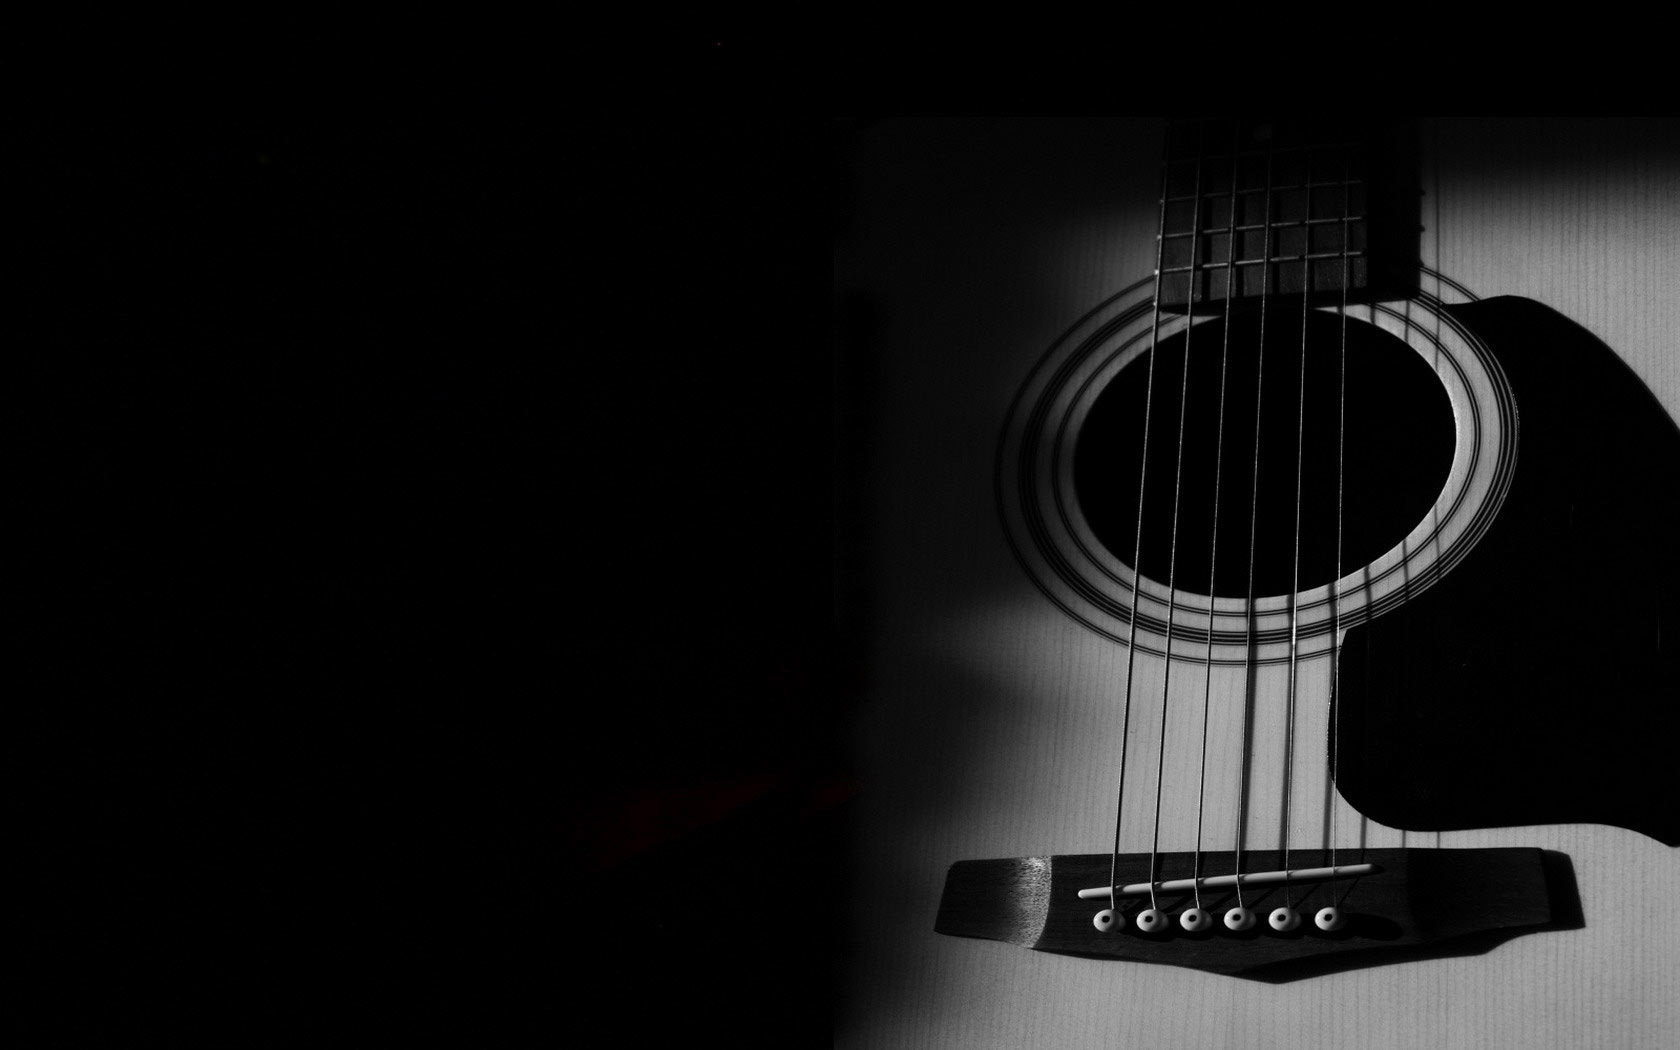 Kirks Guitar Latest Hd Wallpapers Free Download 2 Guitarparadiso